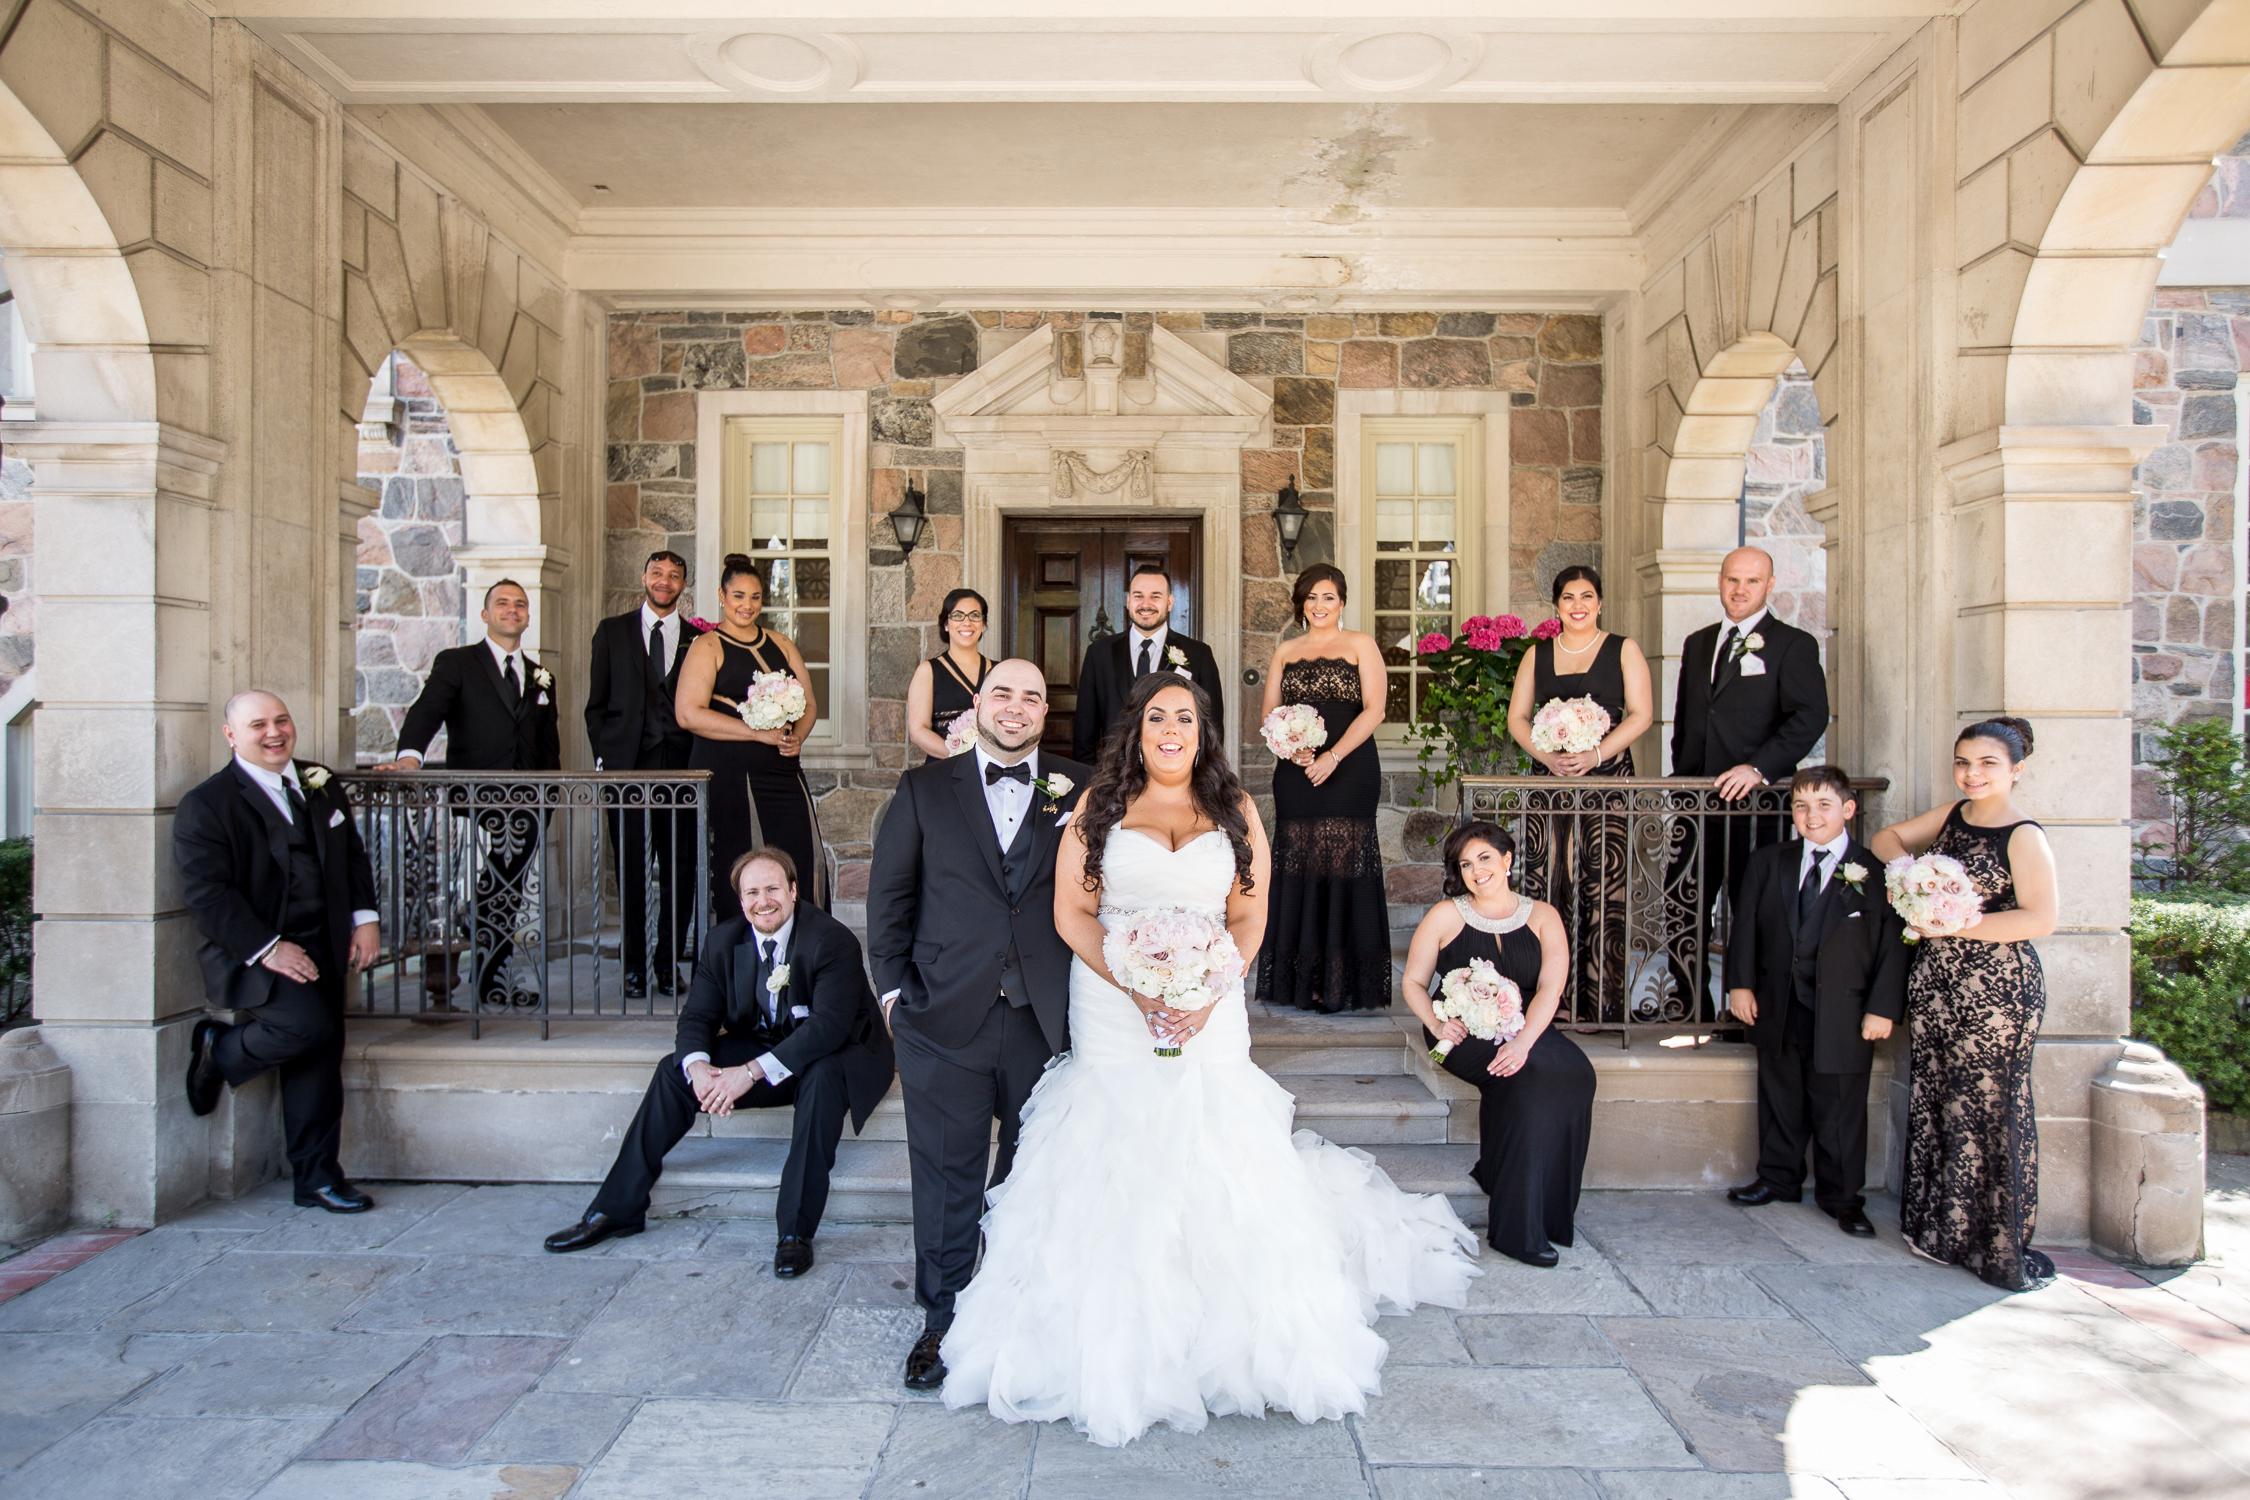 Peter-and-Marie-Wedding-Fontana-Primavera-Graydon-Hall-Manor-Toronto-Ontario-Canada-0024.jpg